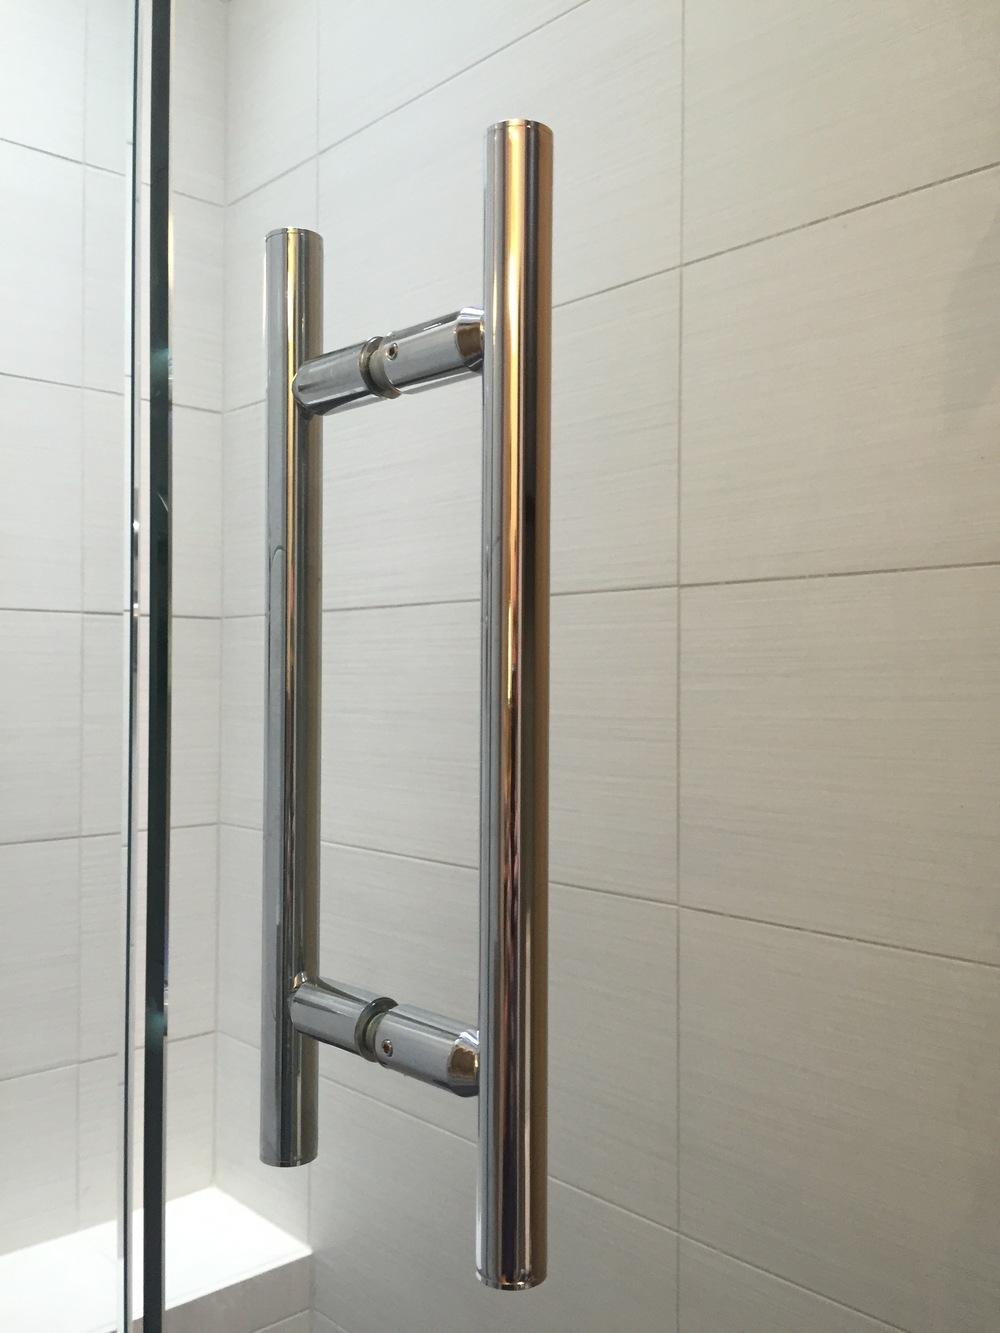 "CRLawrence  Ladder Pull,on 1/2"" tempered glass,  Daltile fabrique blanc linen  12x24 Porcelain Tile"